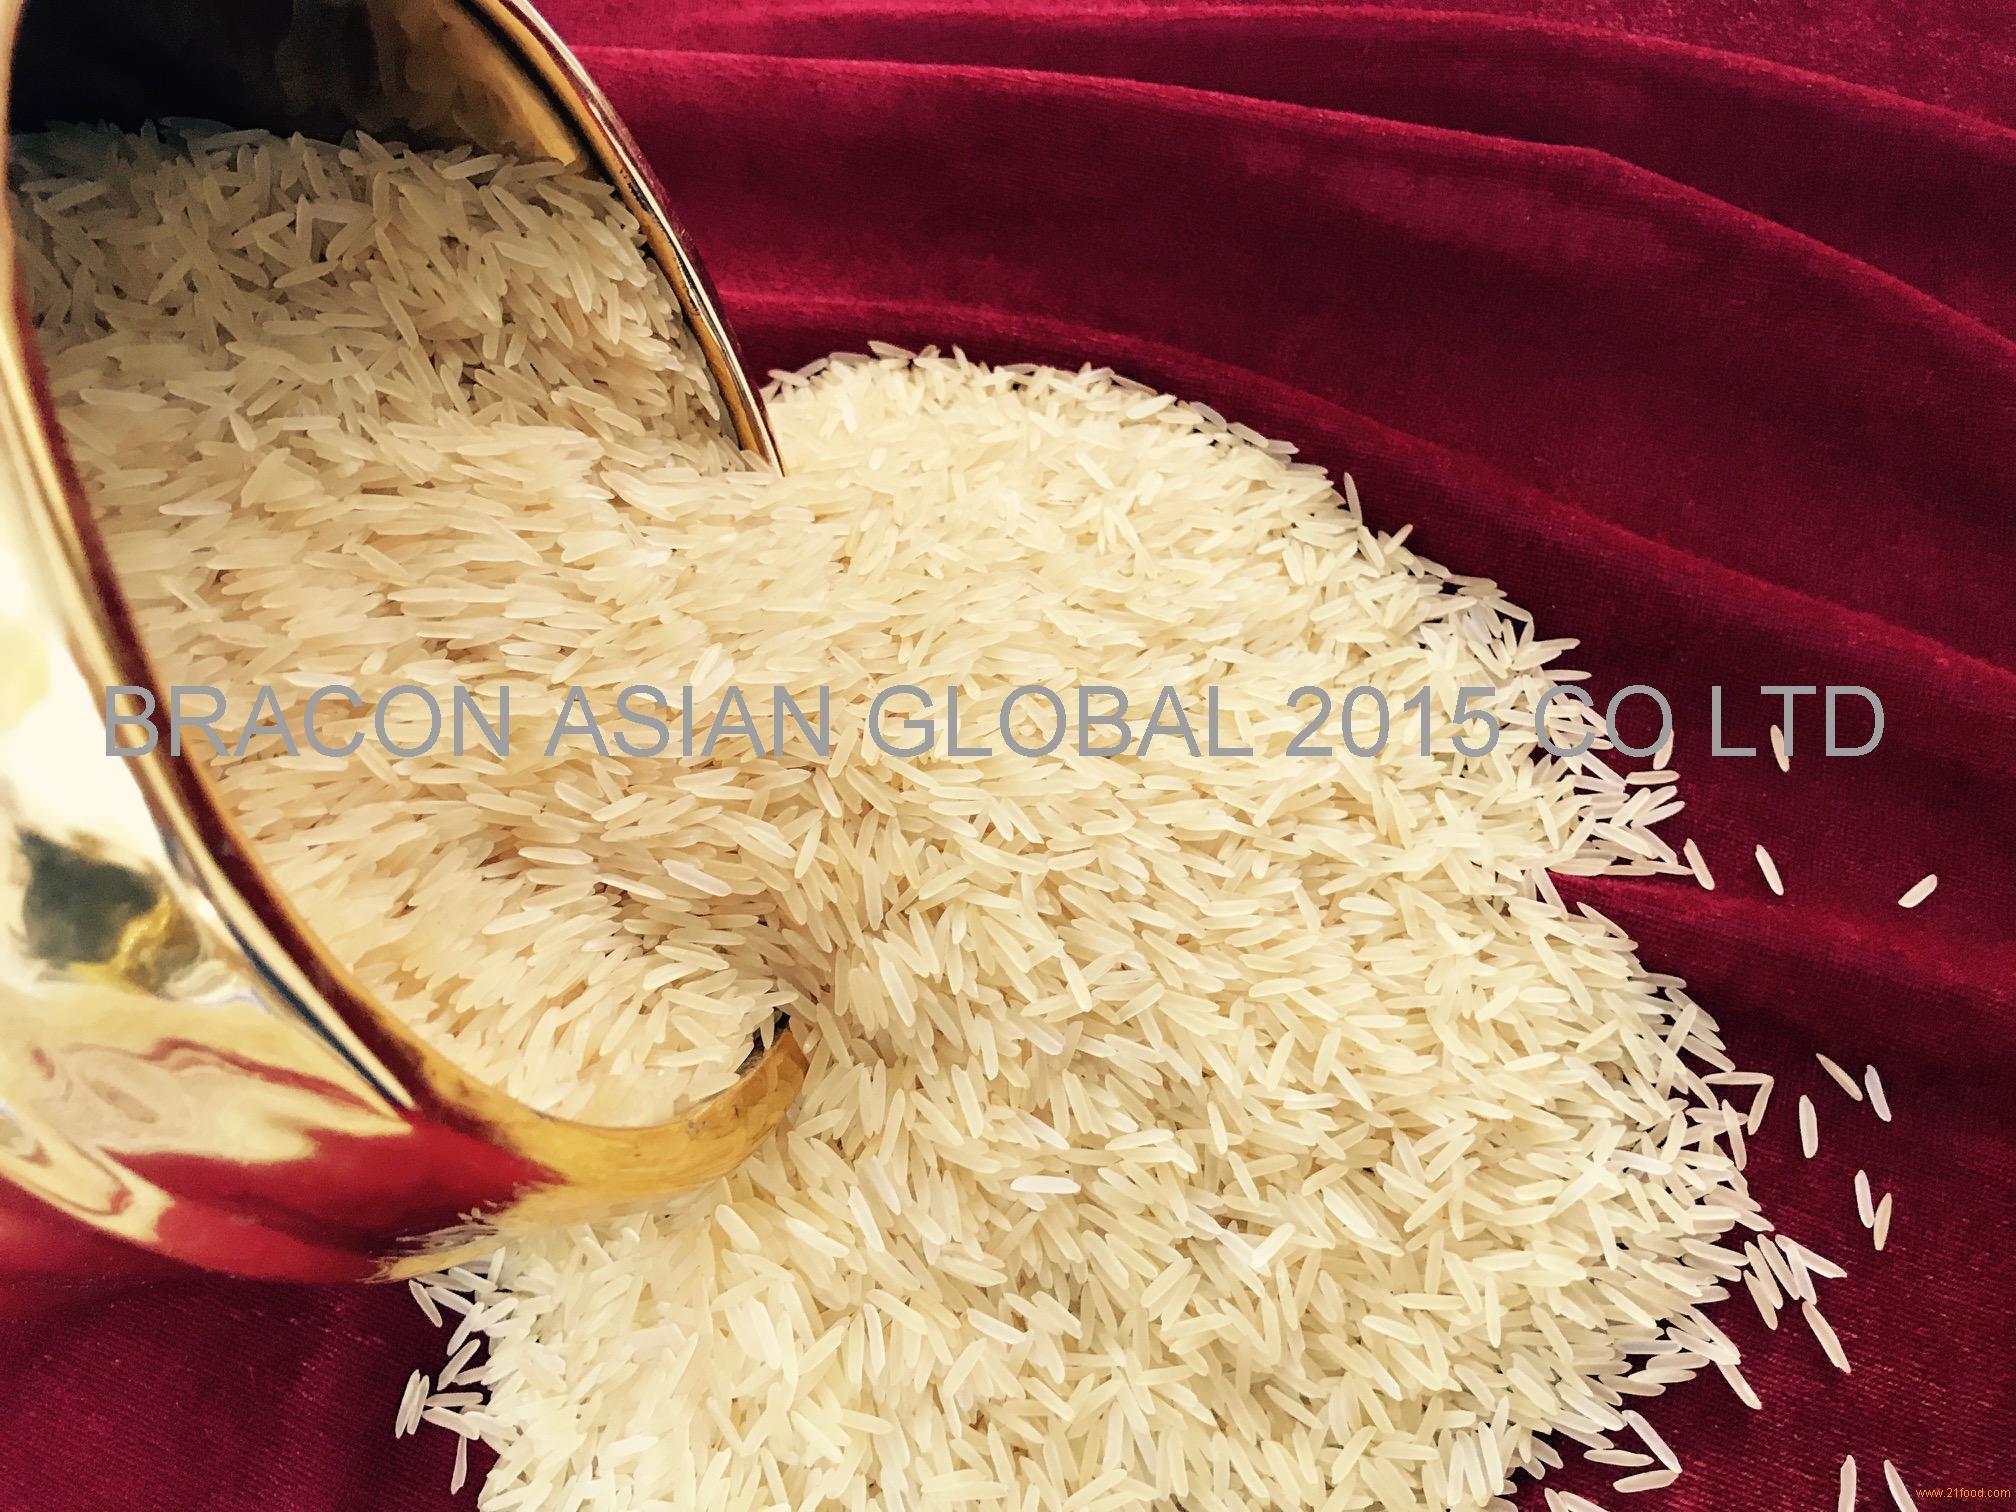 1121 Golden Sella Basmati Rice Thai Parboiled Rice 5%, & Japonica Rice,